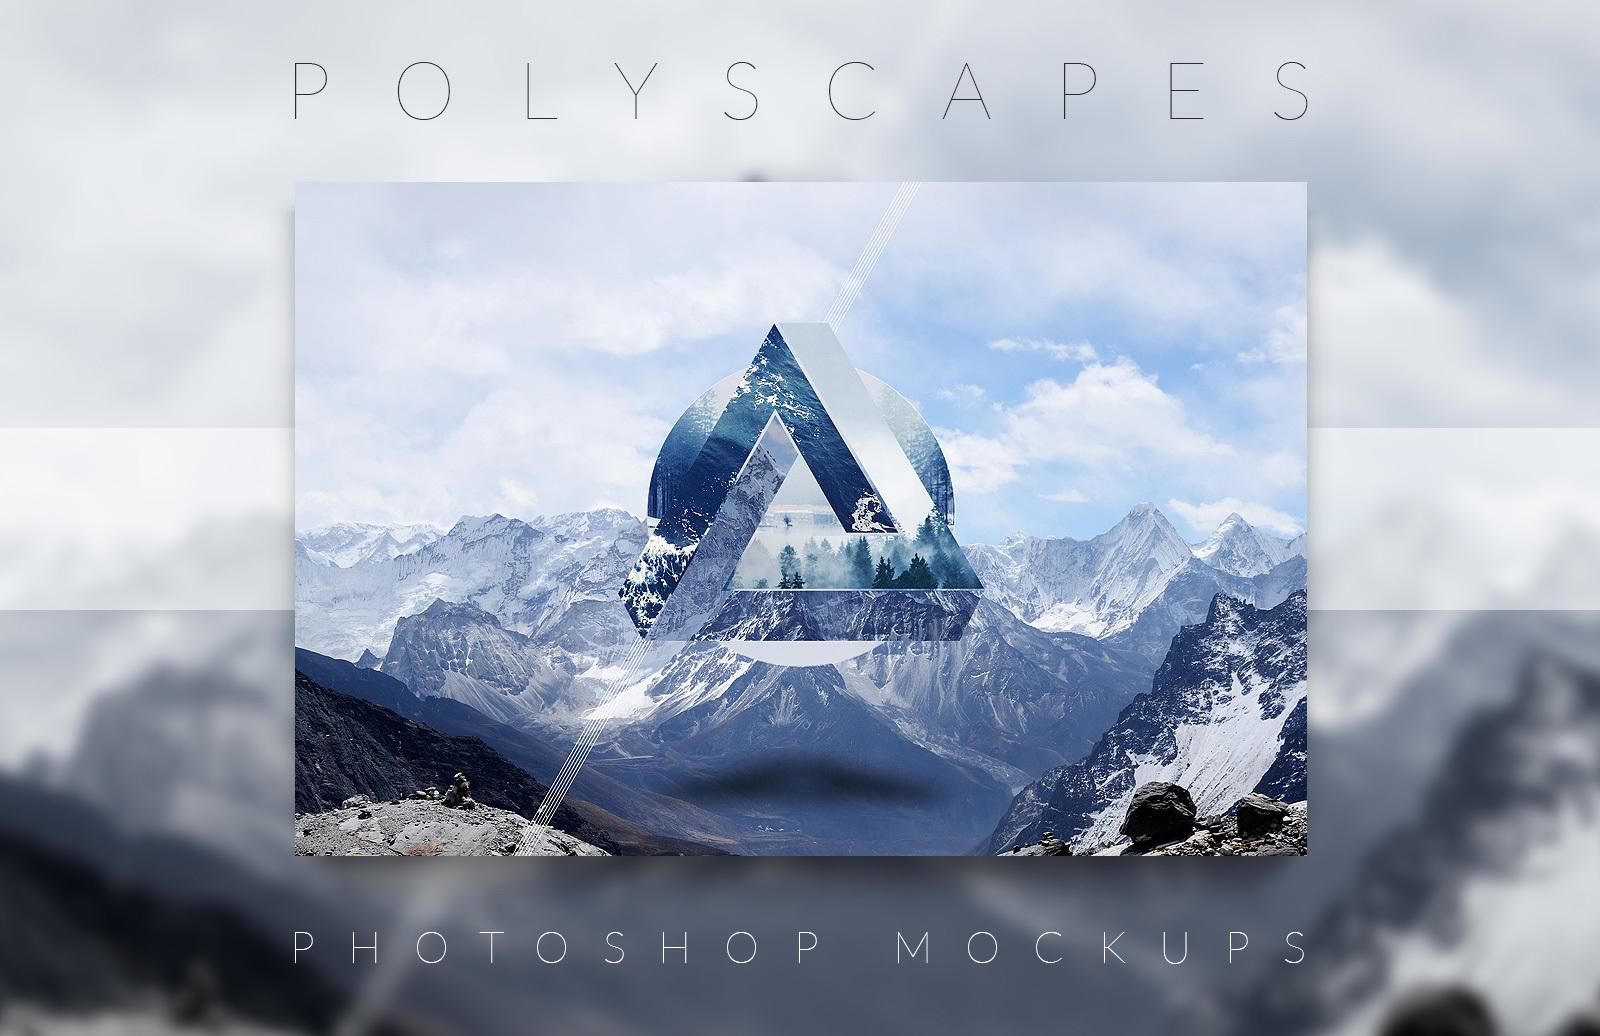 Polyscape Generator Photoshop Mockups